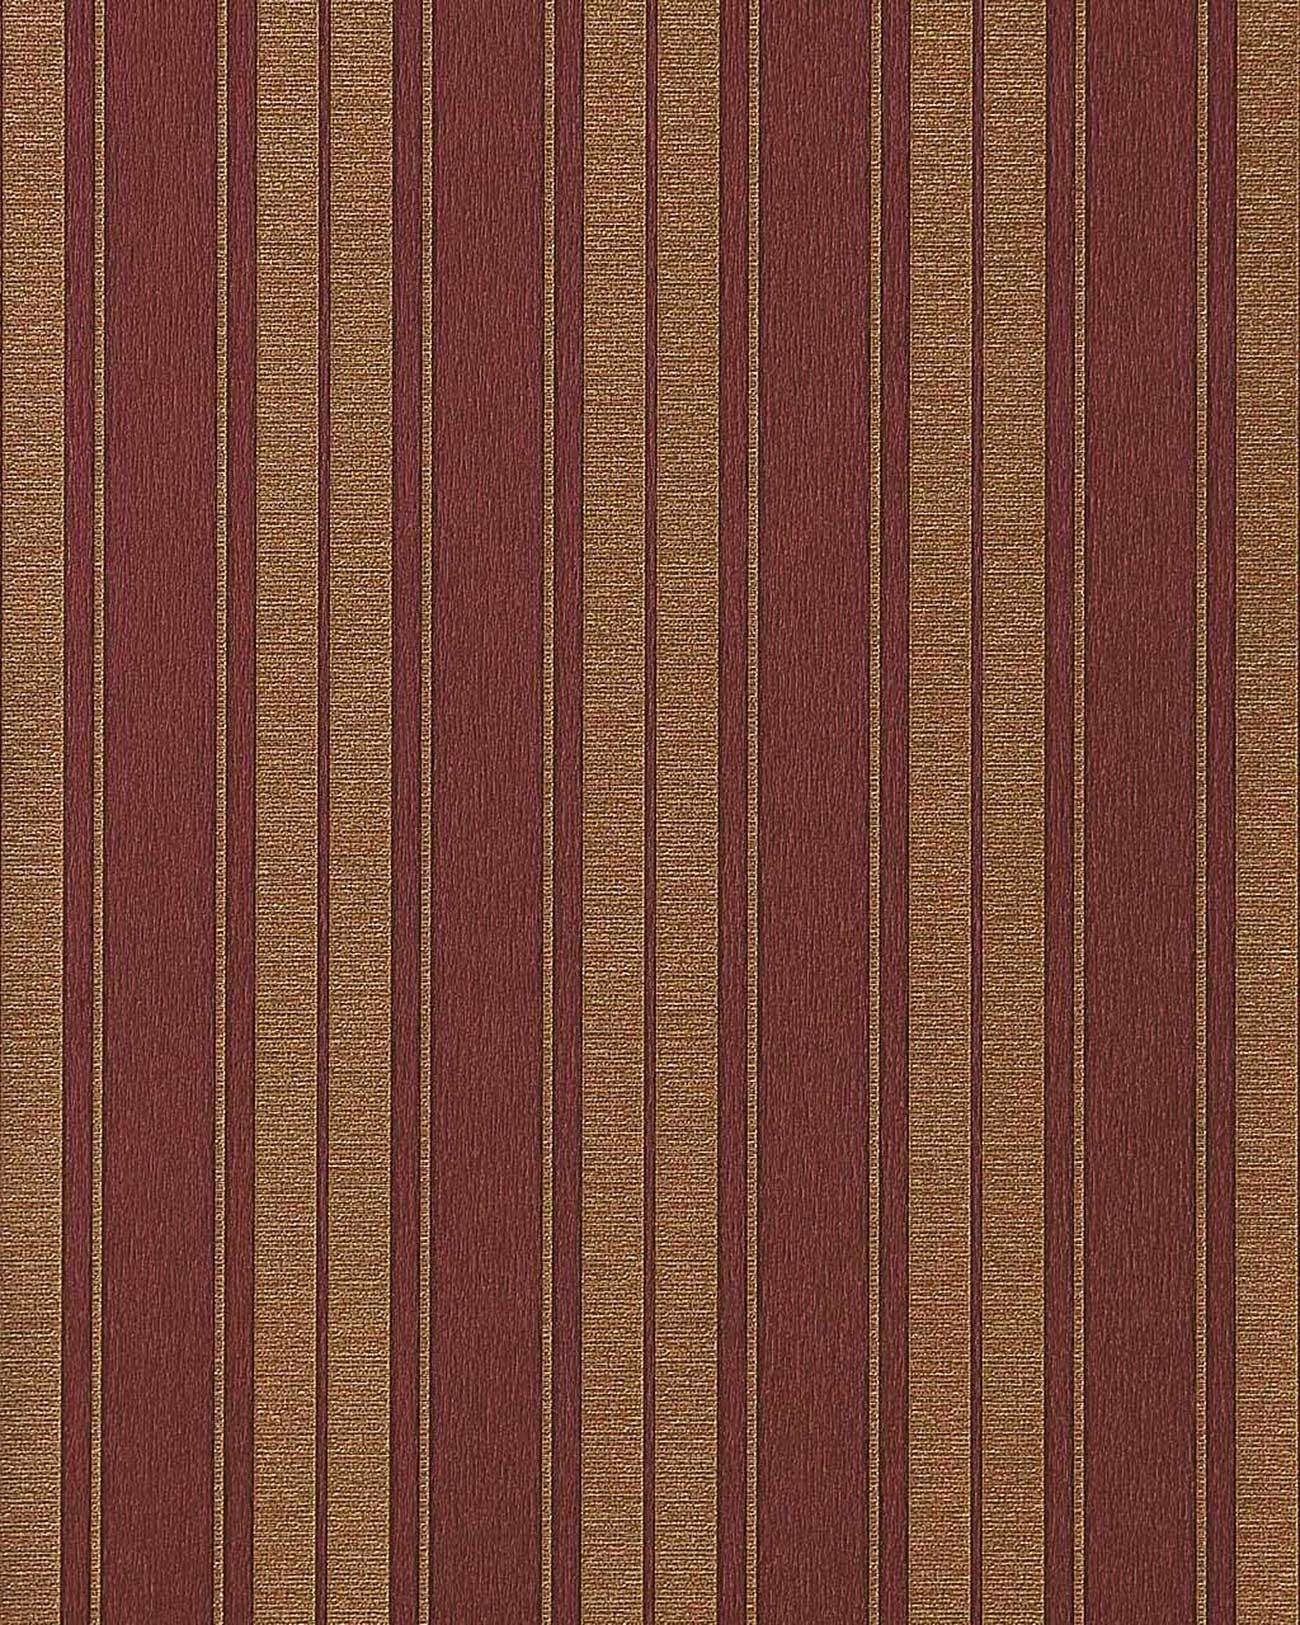 Hochwertige K?chen Tapeten : Red and Gold Striped Wallpaper